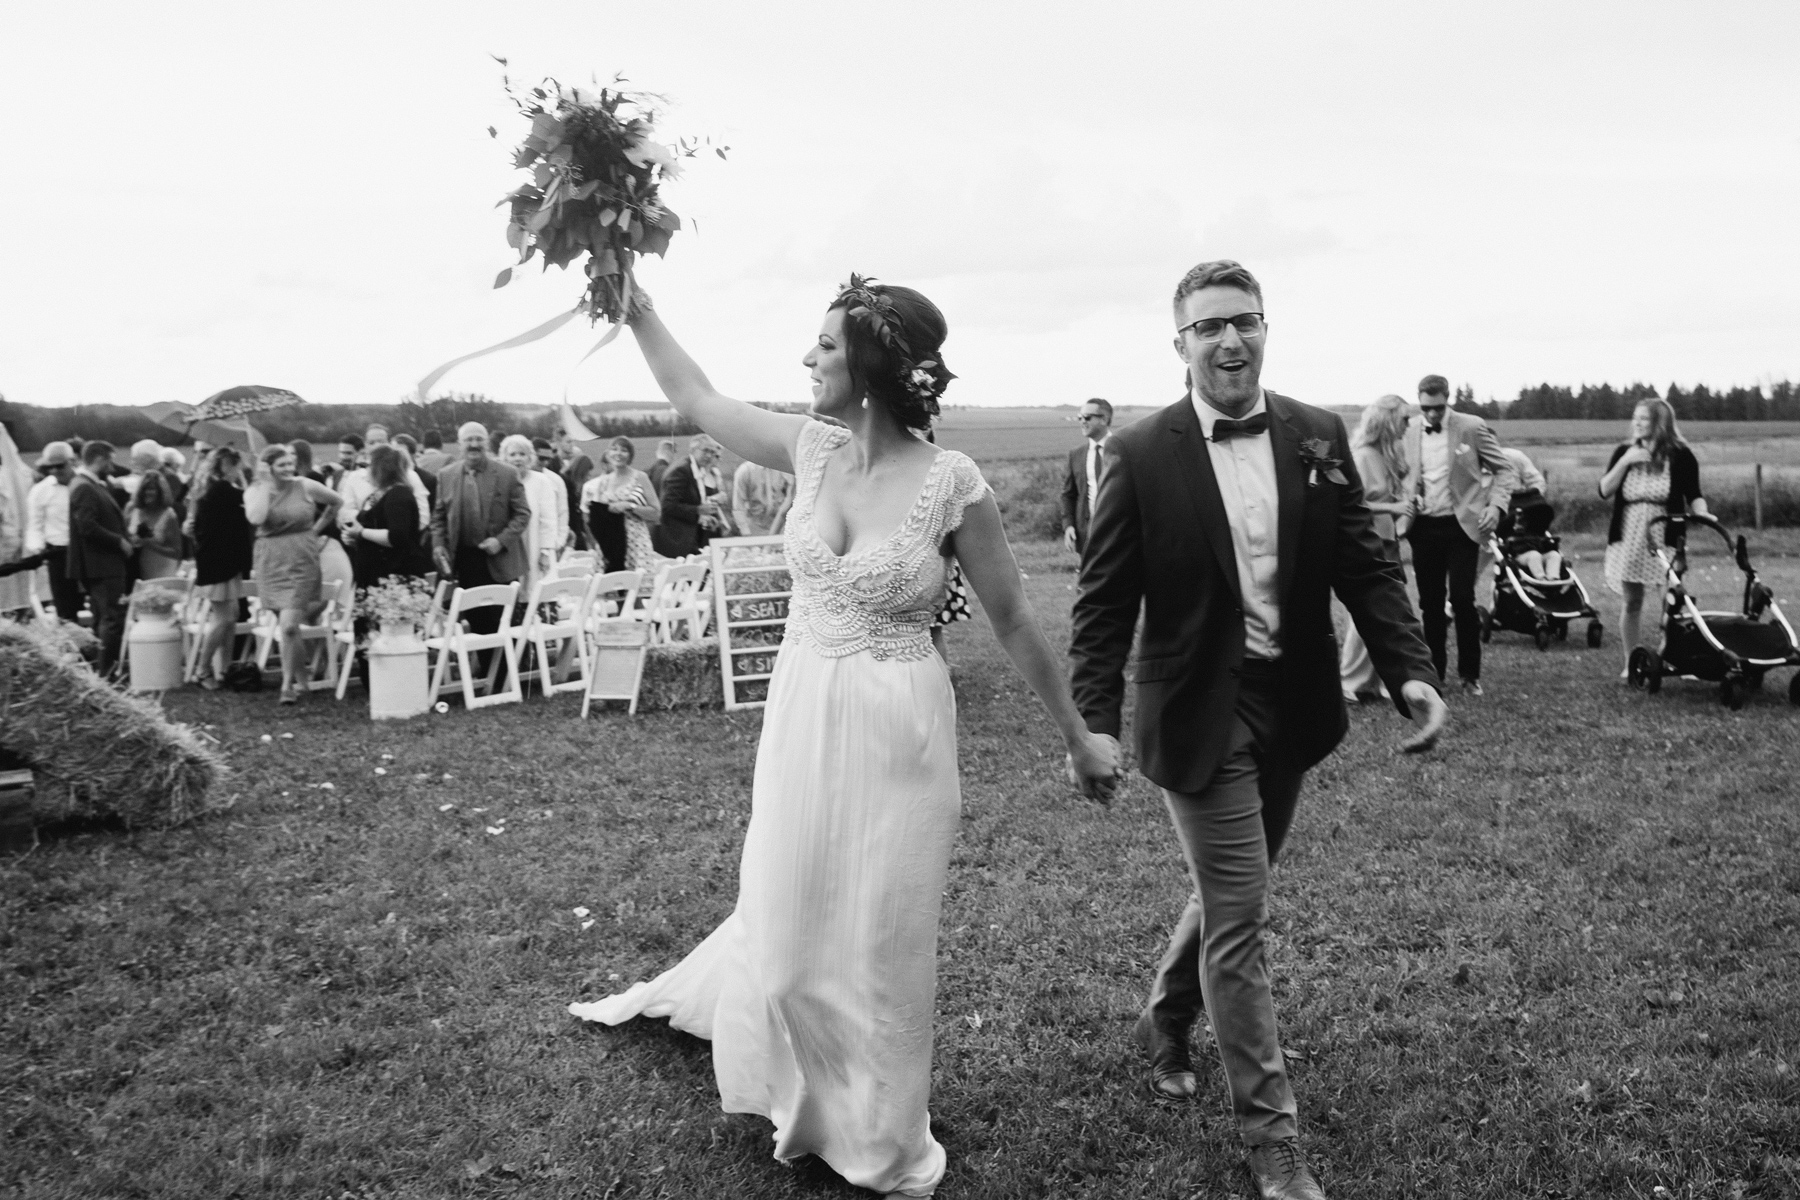 alberta-farm-wedding-photographer-rp-wj-149.jpg